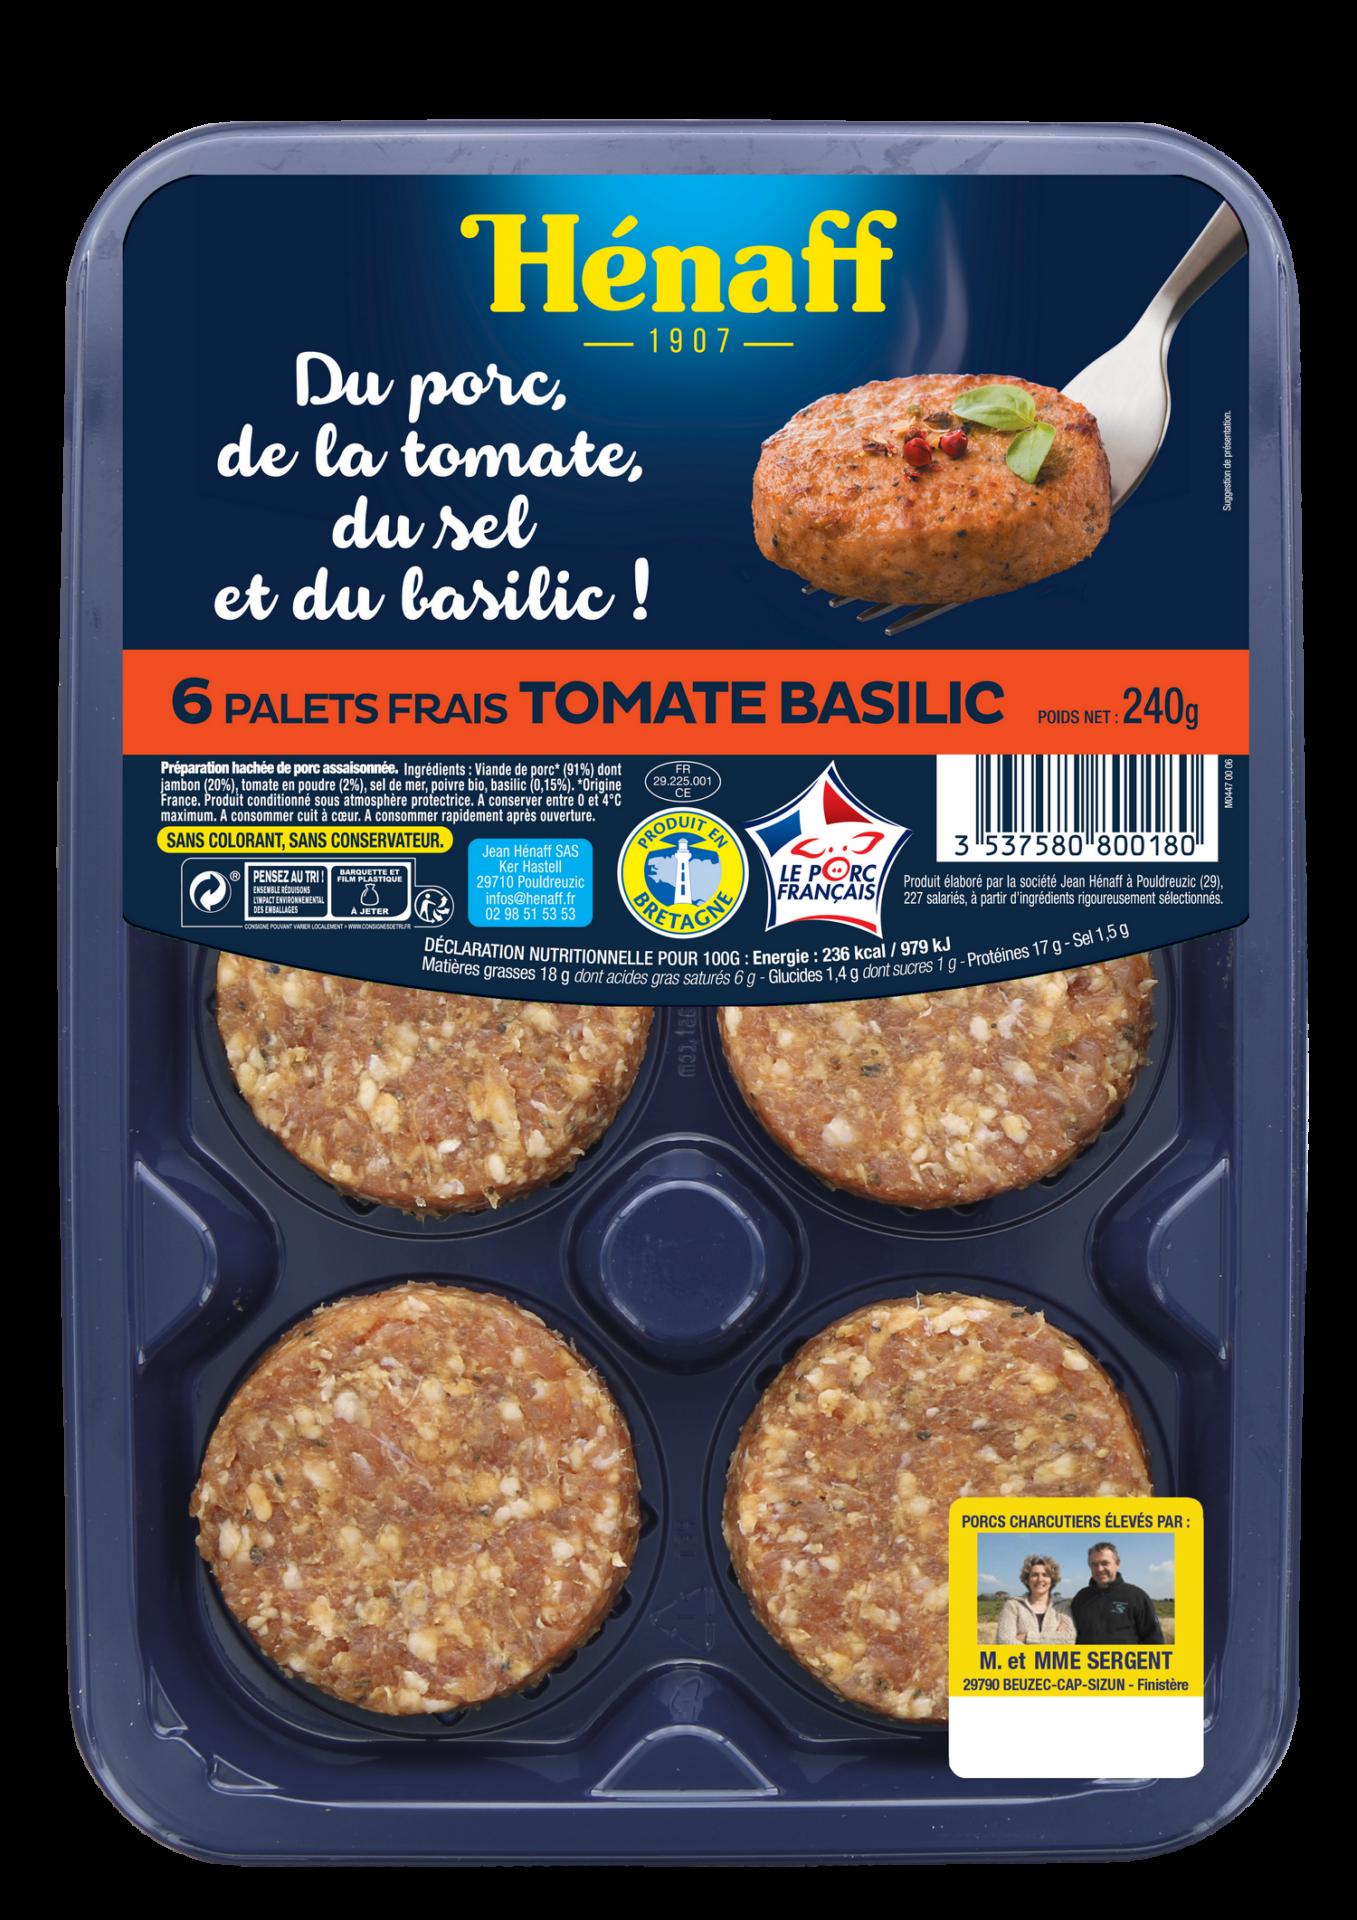 Palets frais Hénaff - tomate basilic